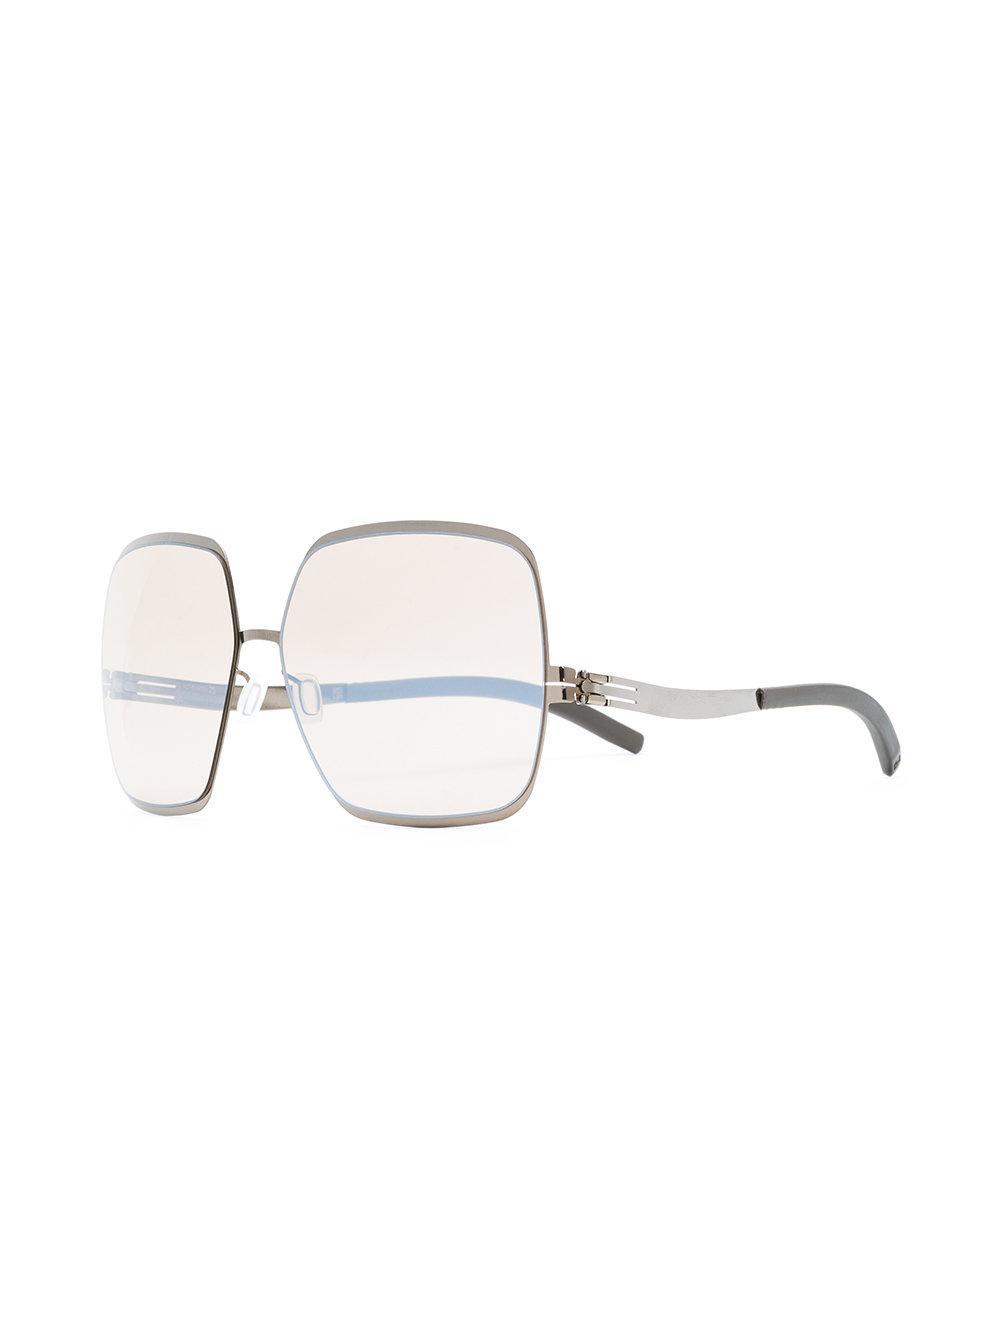 Ic! Berlin Angelina Sunglasses in Grey (Grey)